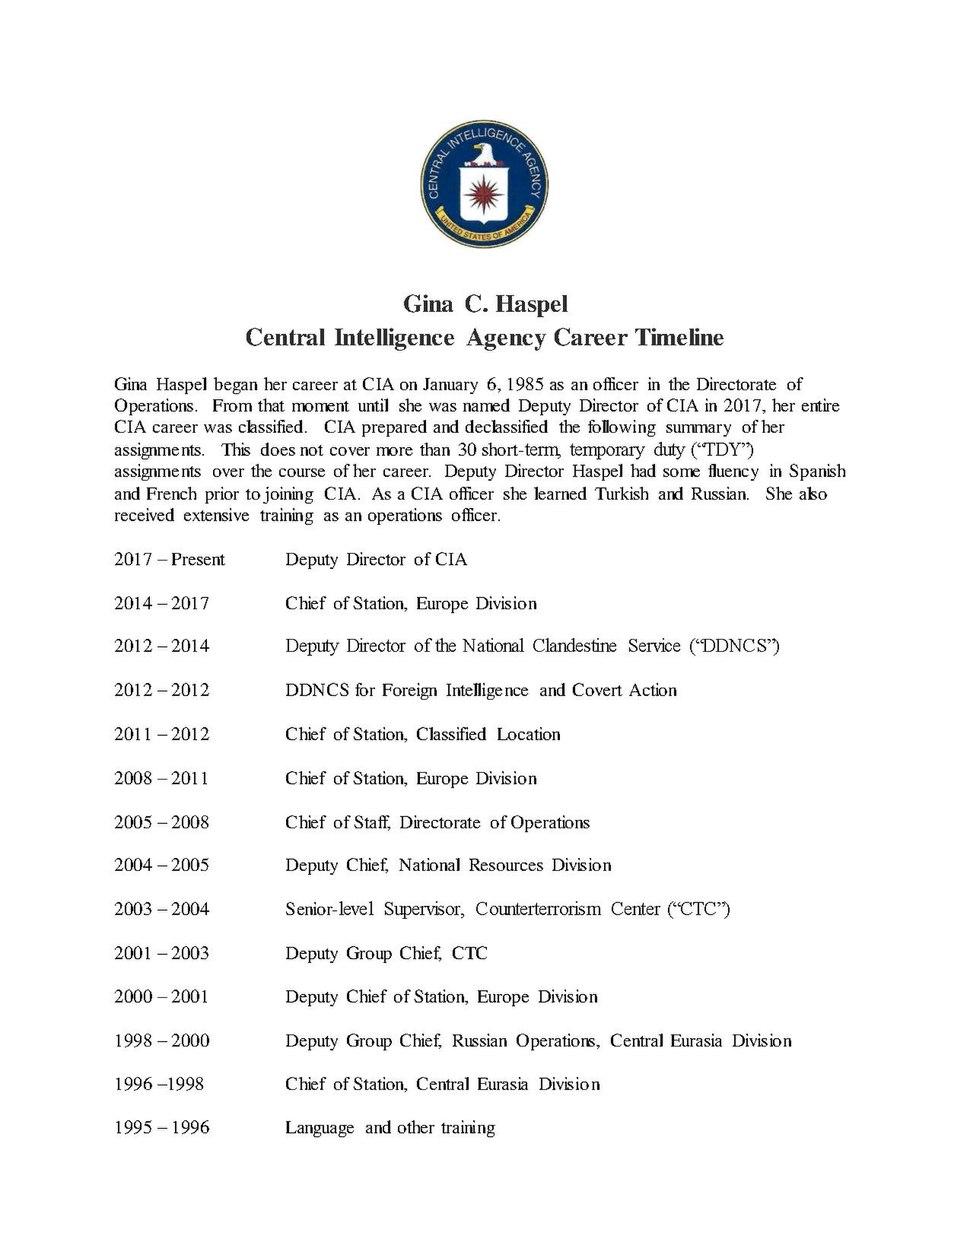 Gina C. Haspel - CIA Career Timeline, 1 May 2018.pdf